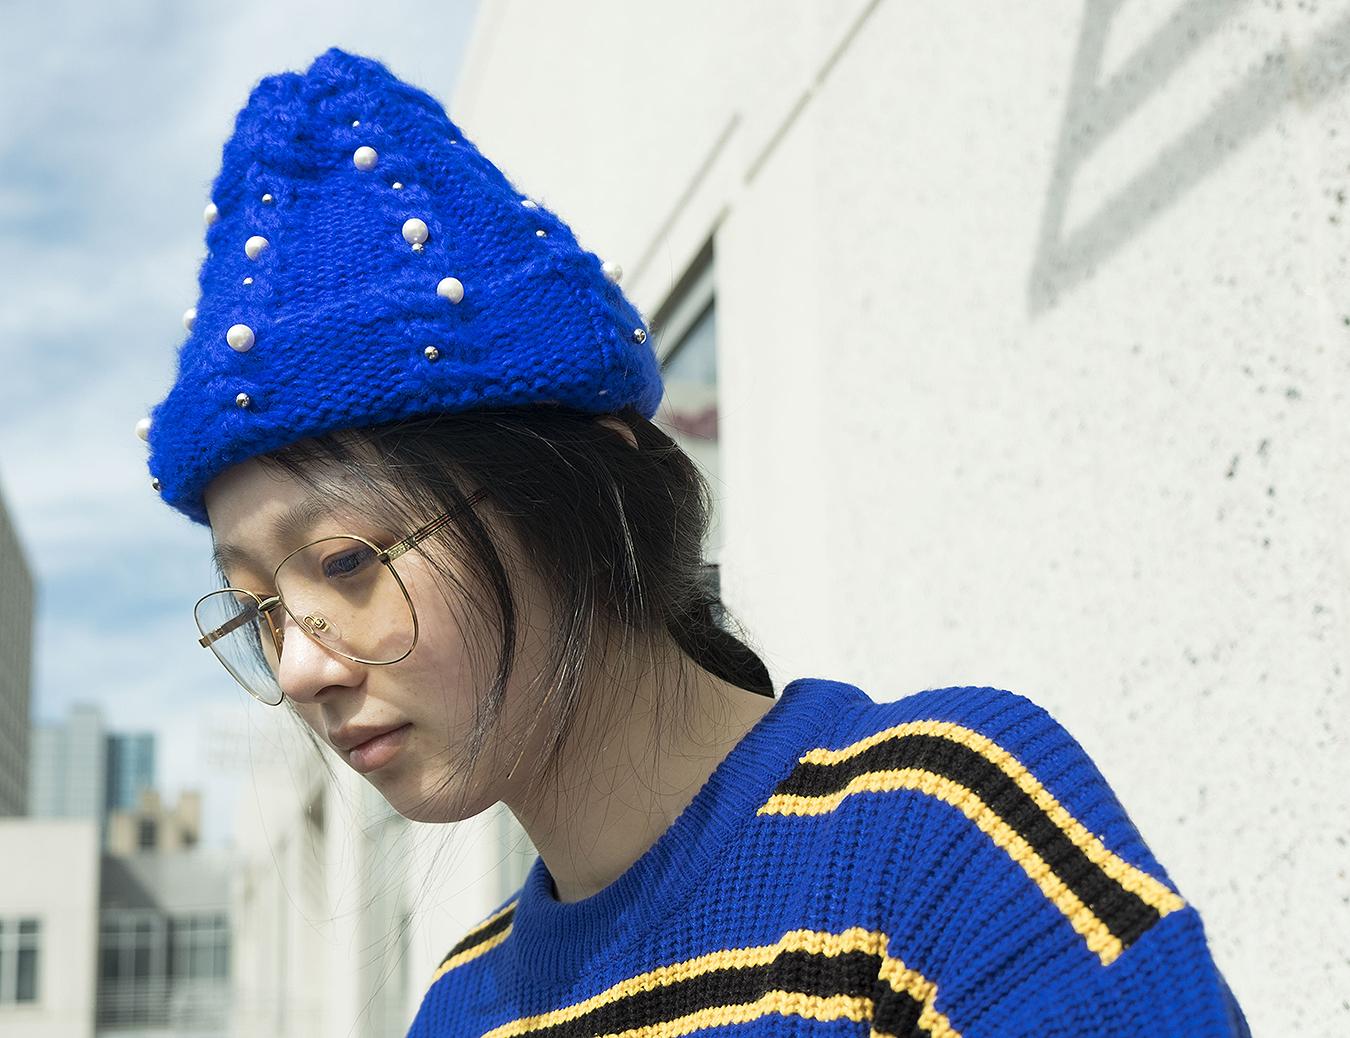 RONGRONG_LIU_STREET_fashion_photography_modern_blue_hat_Asian_student_UPenn